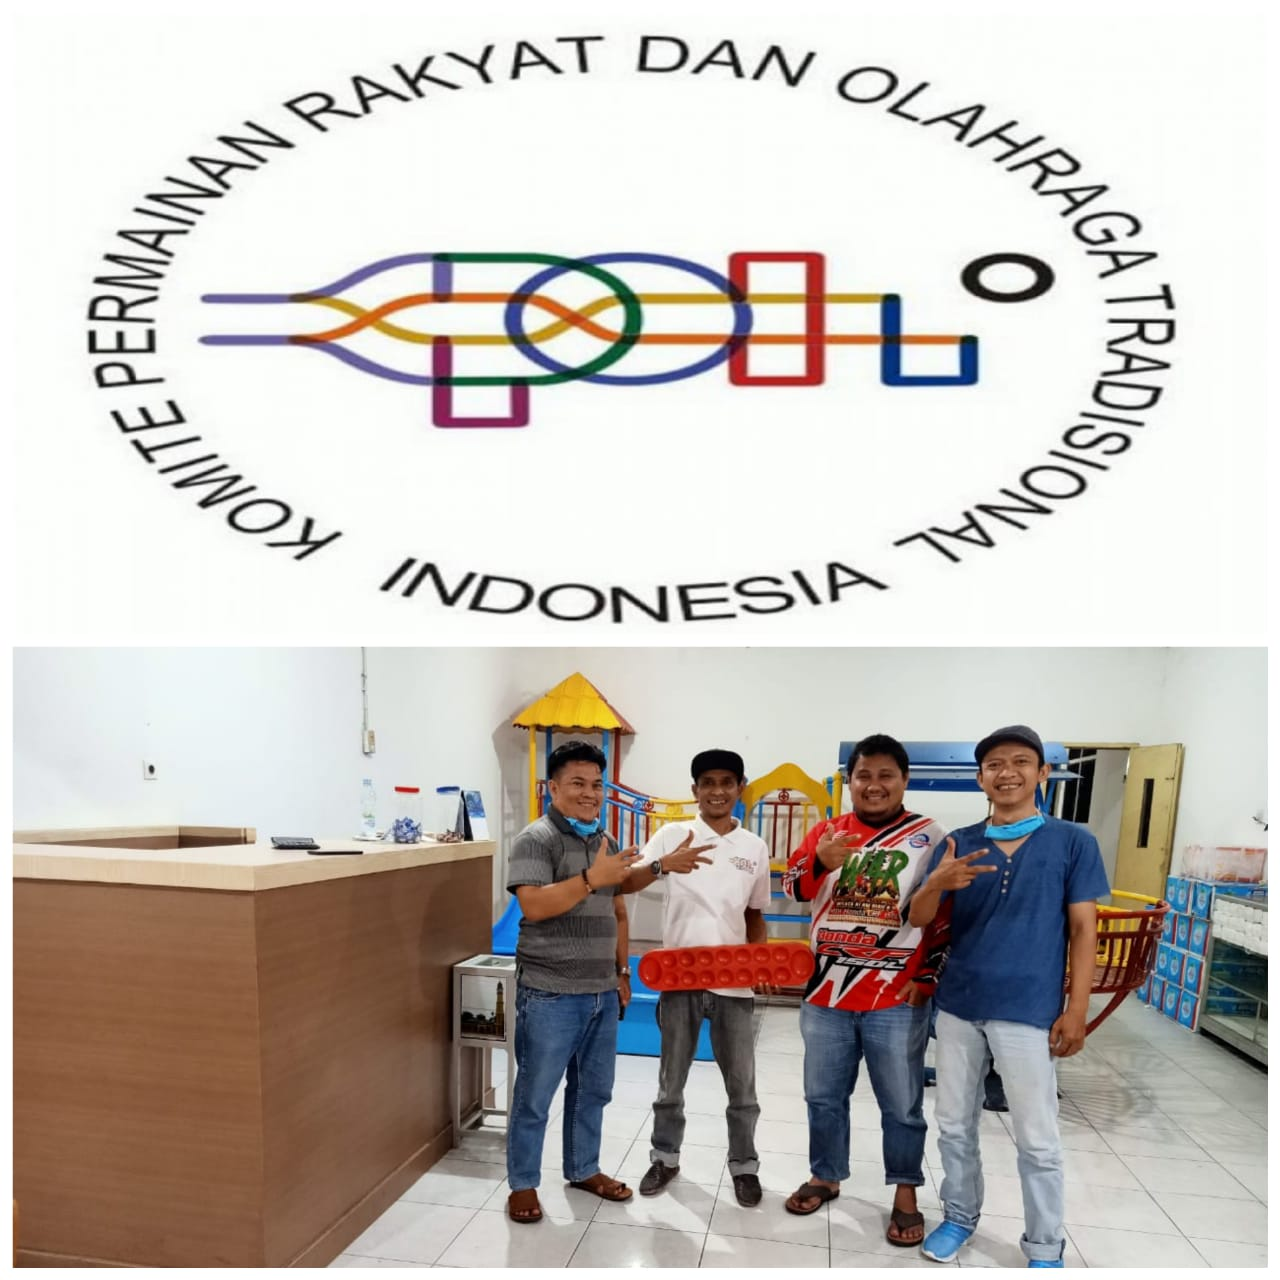 Kpoti Riau Akan Segera Serahkan Mandat Kepada Kpoti Kabupaten Bengkalis